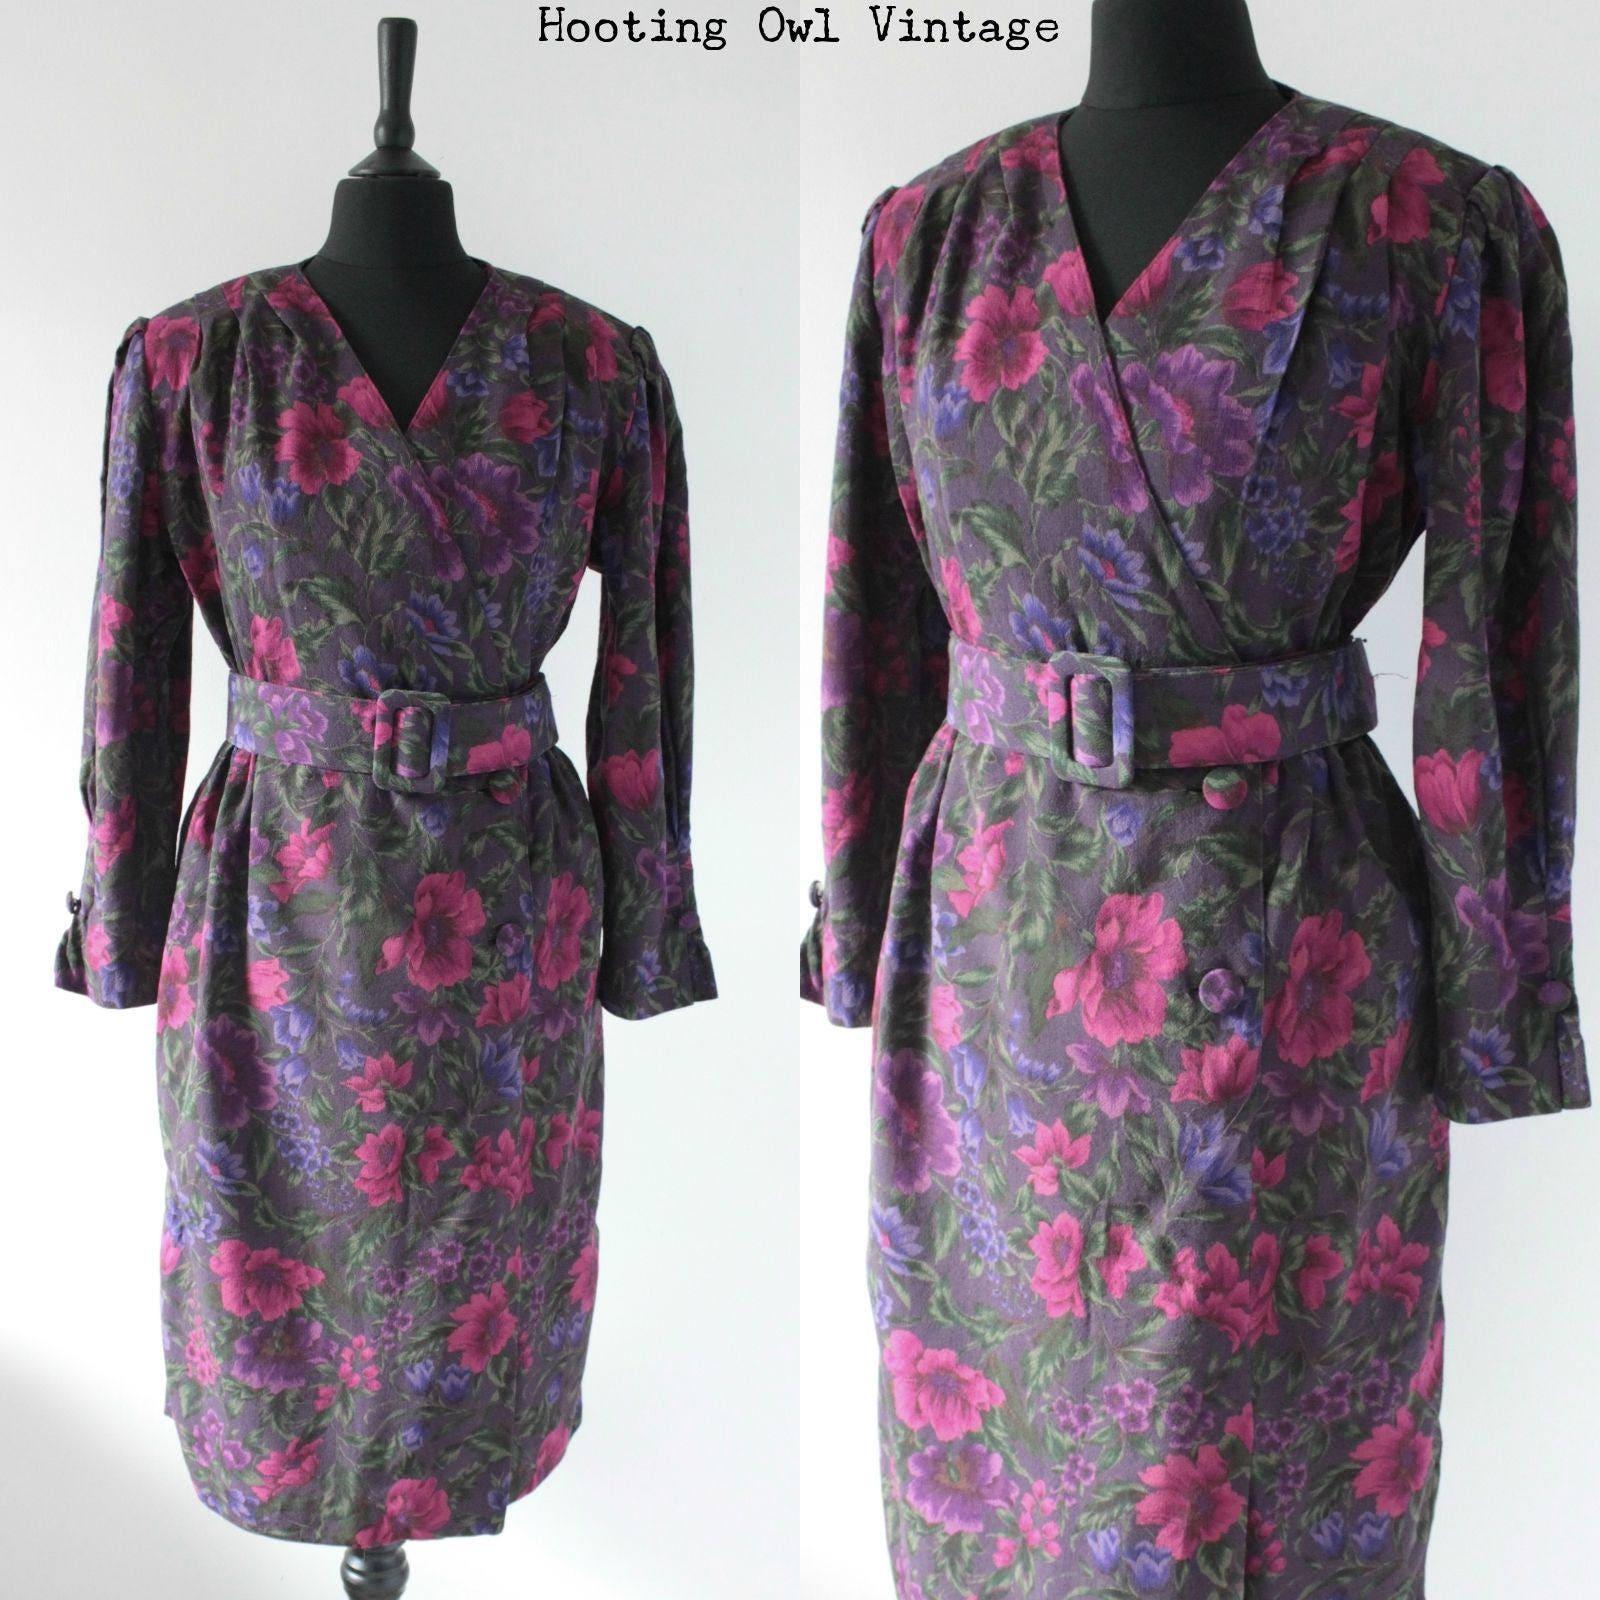 1980s Vintage Party Dress 80s Floral Dress 1940s Landgirl ww2 revival Style Tea Dress. Structured Floral Dress uk 12 m medium